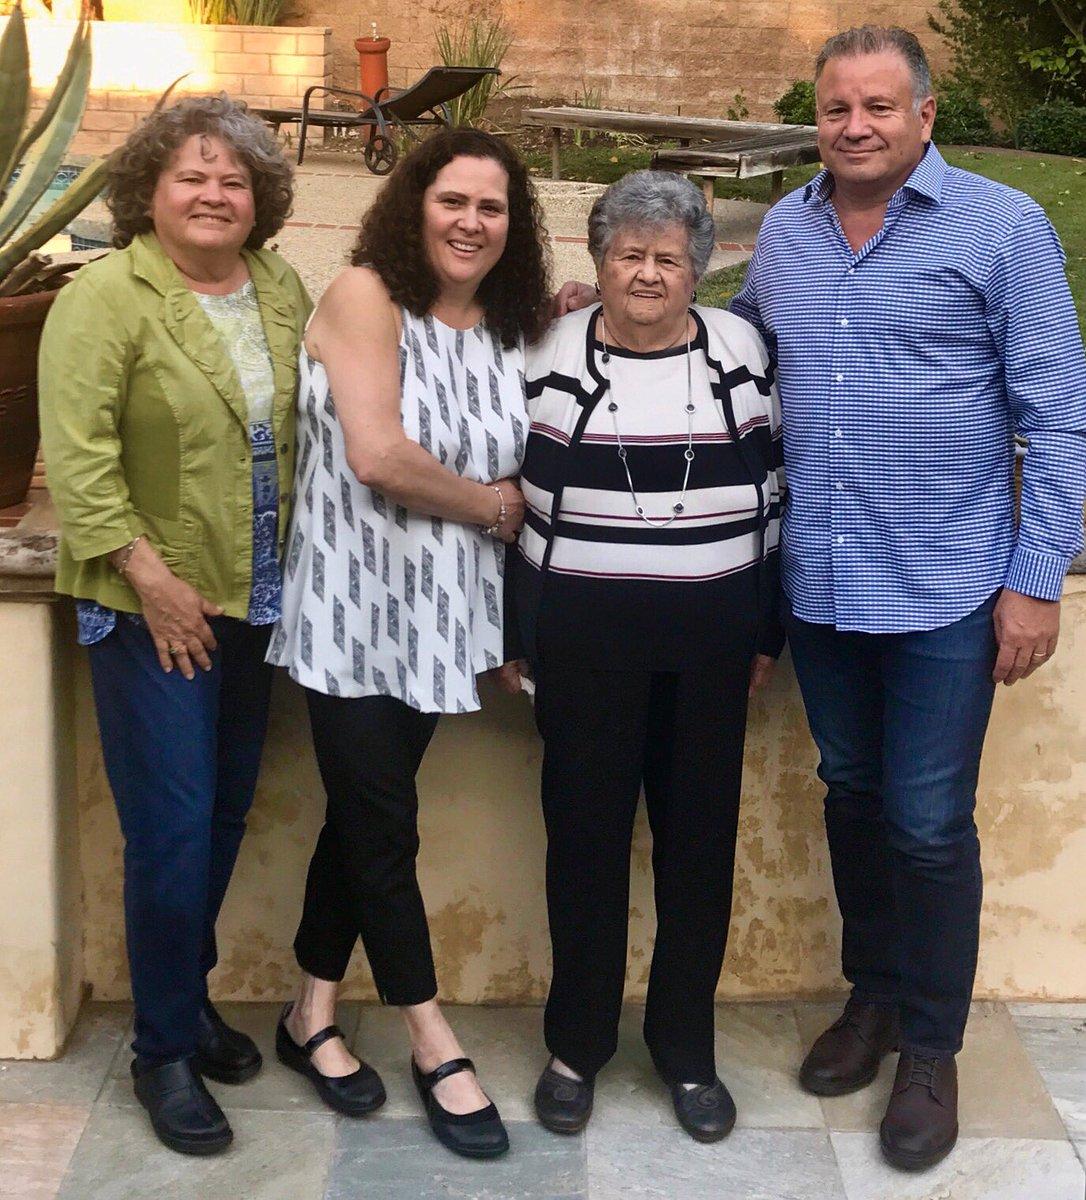 Our founder, Rosa, turns 87 today! She celebrated w her family &amp; a #Portos #Cuban #cake, her original recipe! #HappyBirthdayRosa <br>http://pic.twitter.com/47AxFzniba